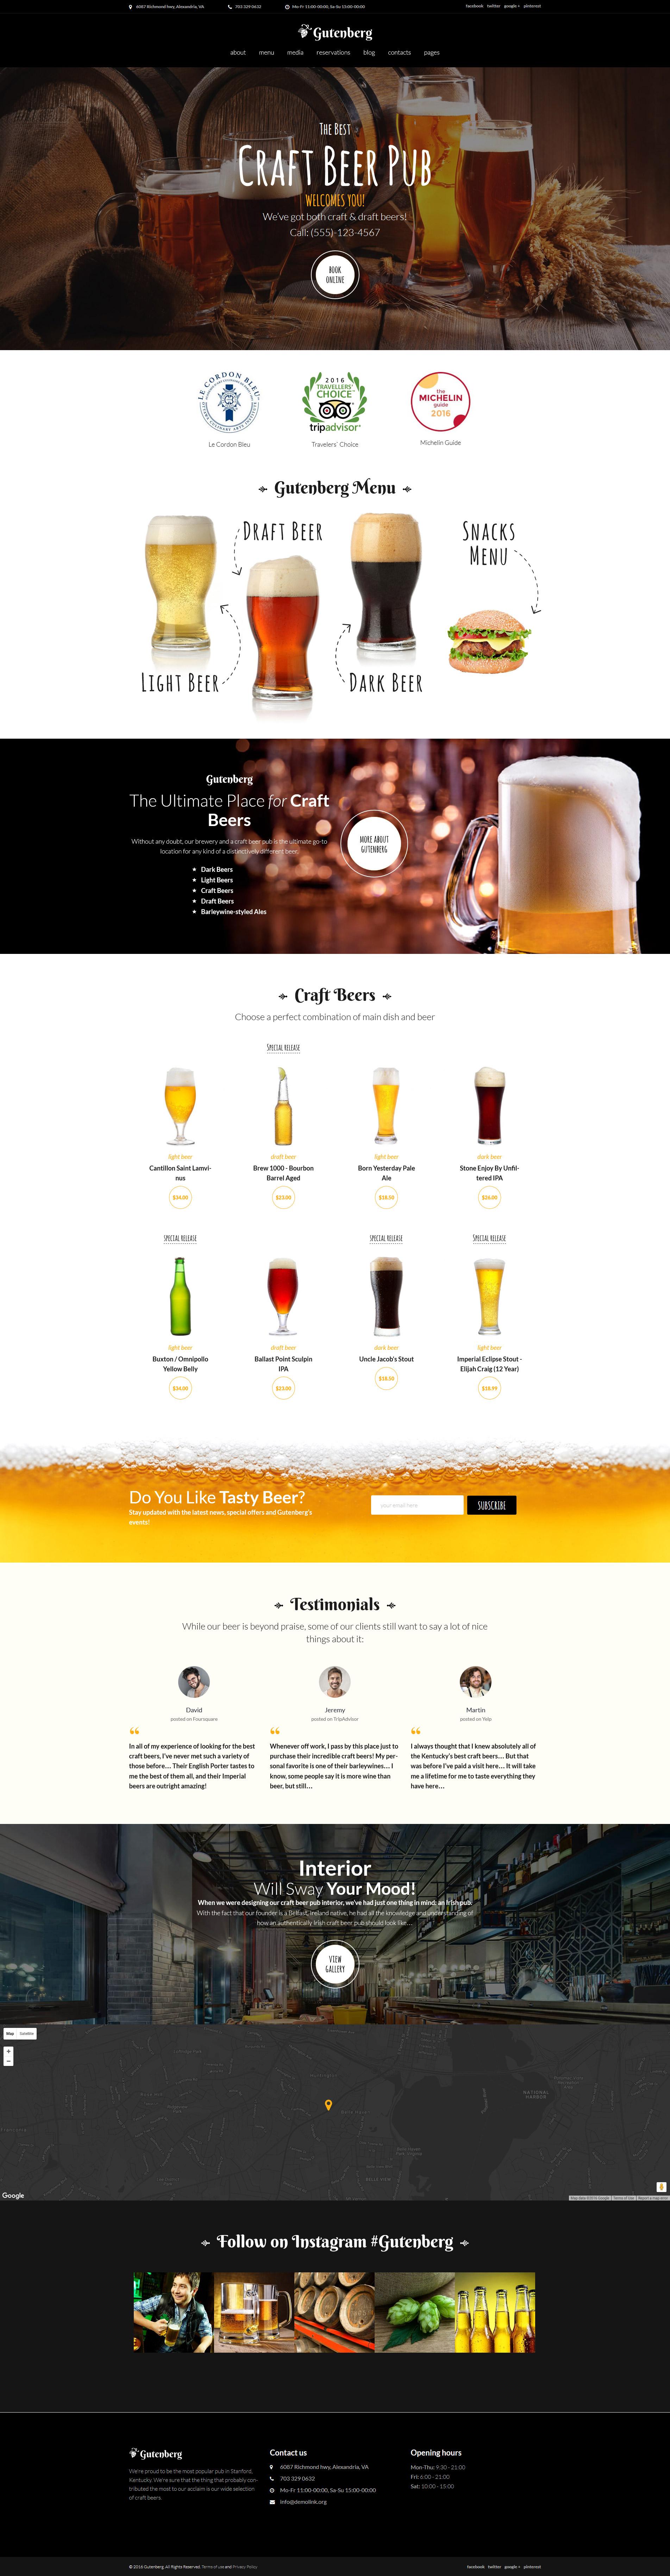 "WordPress Theme namens ""GutenBerg - Beer Pub and Brewery"" #59005"